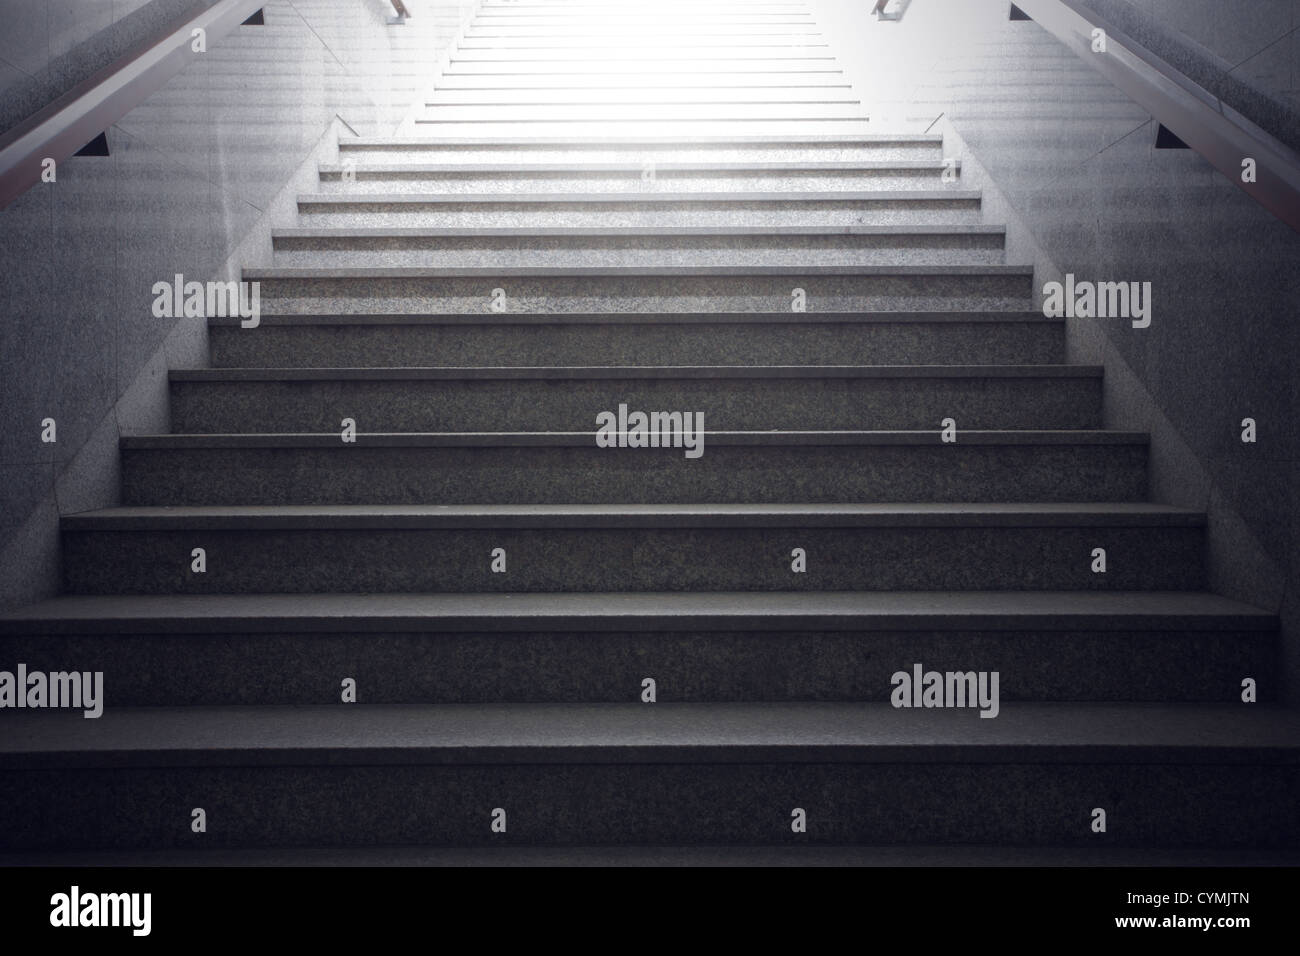 Stairway to heaven Photo Stock